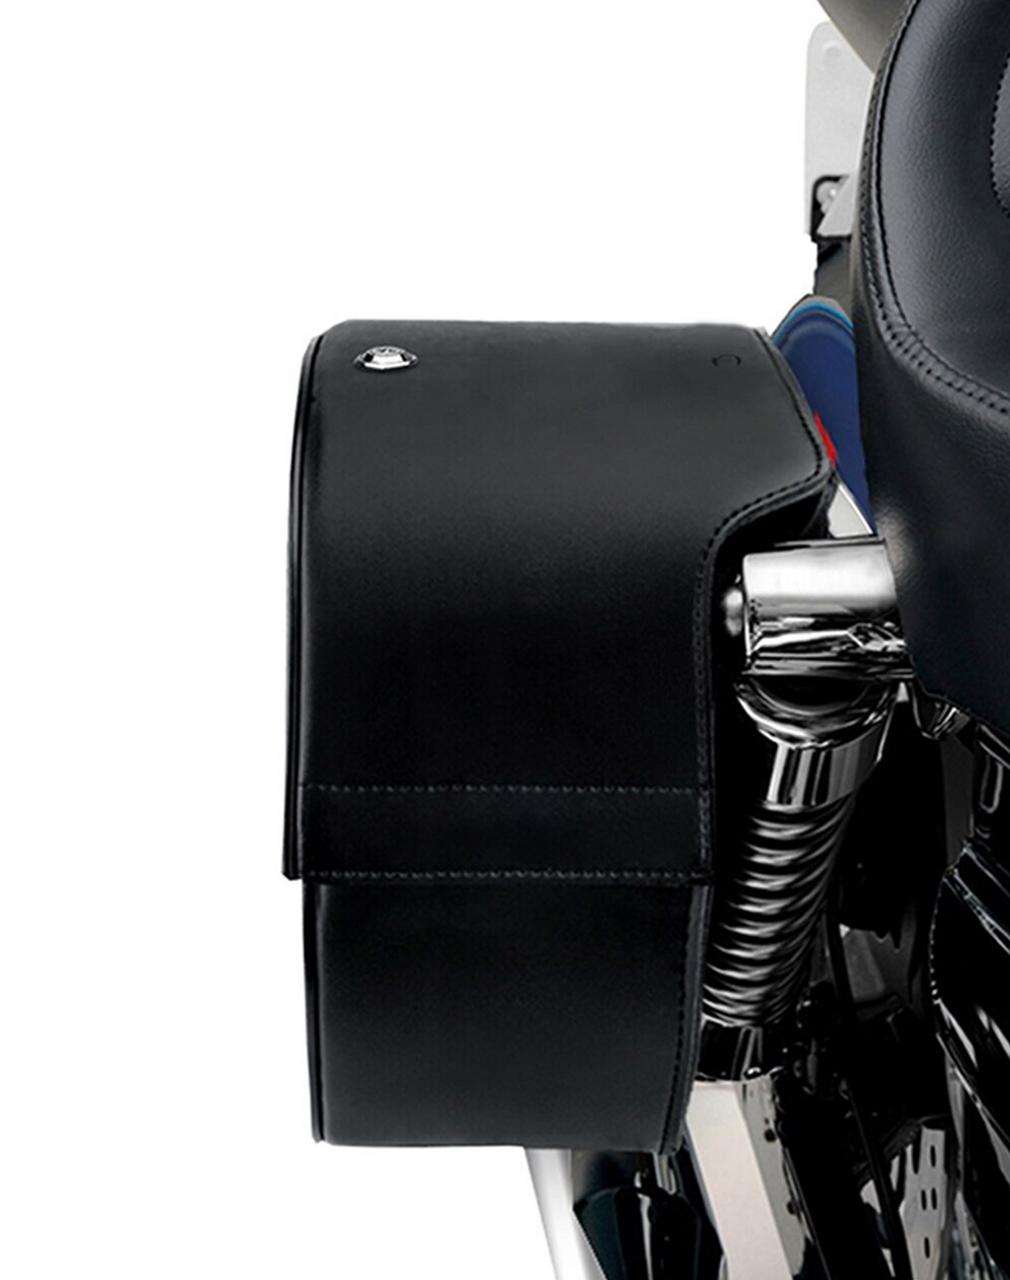 Viking Shock Cutout Slanted Studded Large Motorcycle Saddlebags For Harley Dyna Street Bob FXDB Shock Cutout View